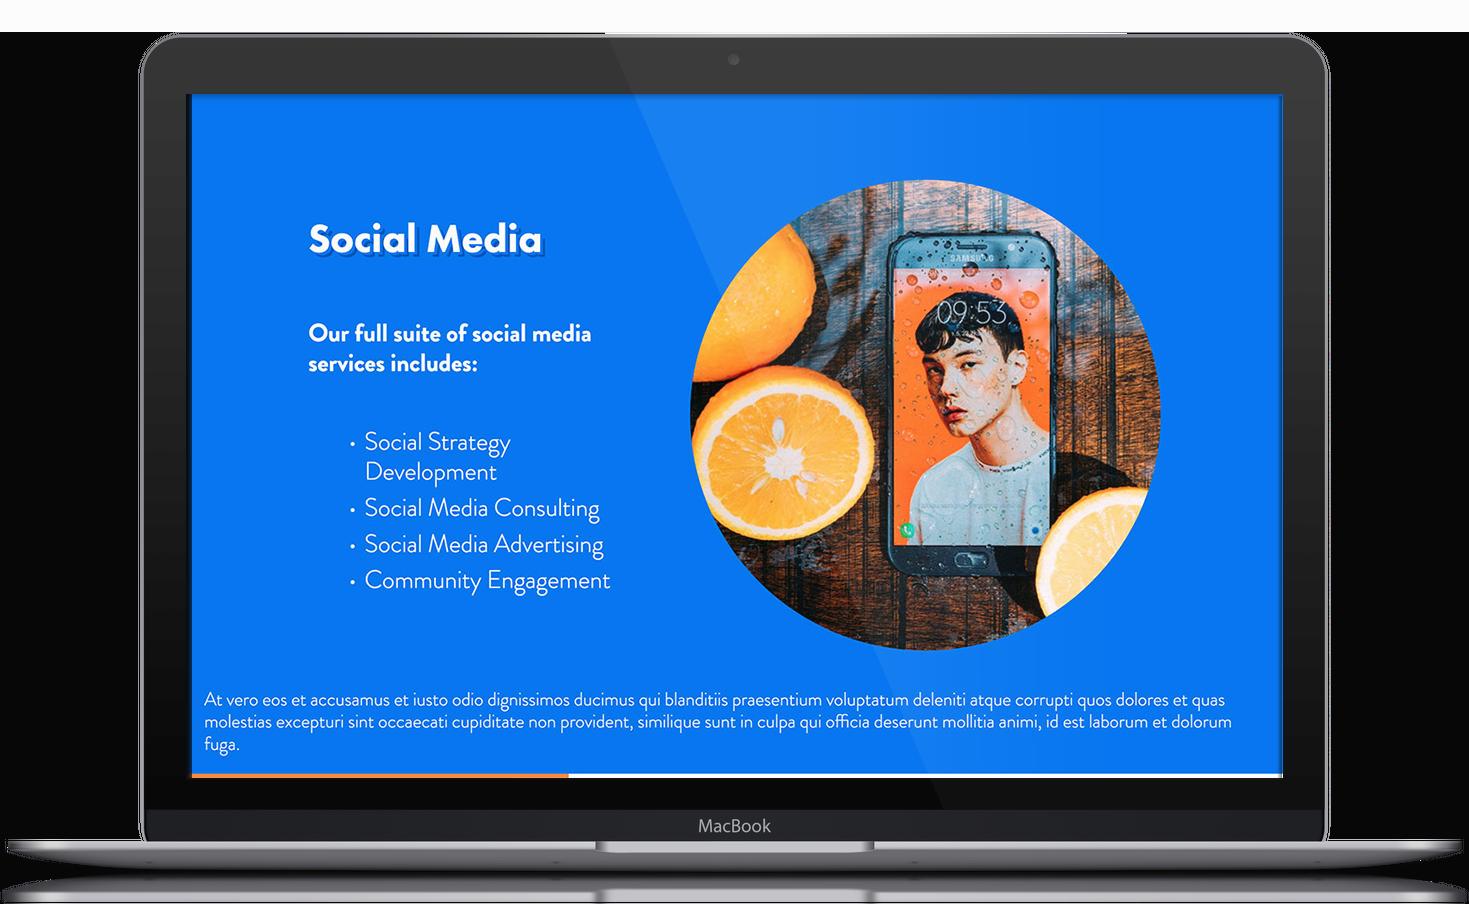 Digital-marketing-proposal-template-4.png